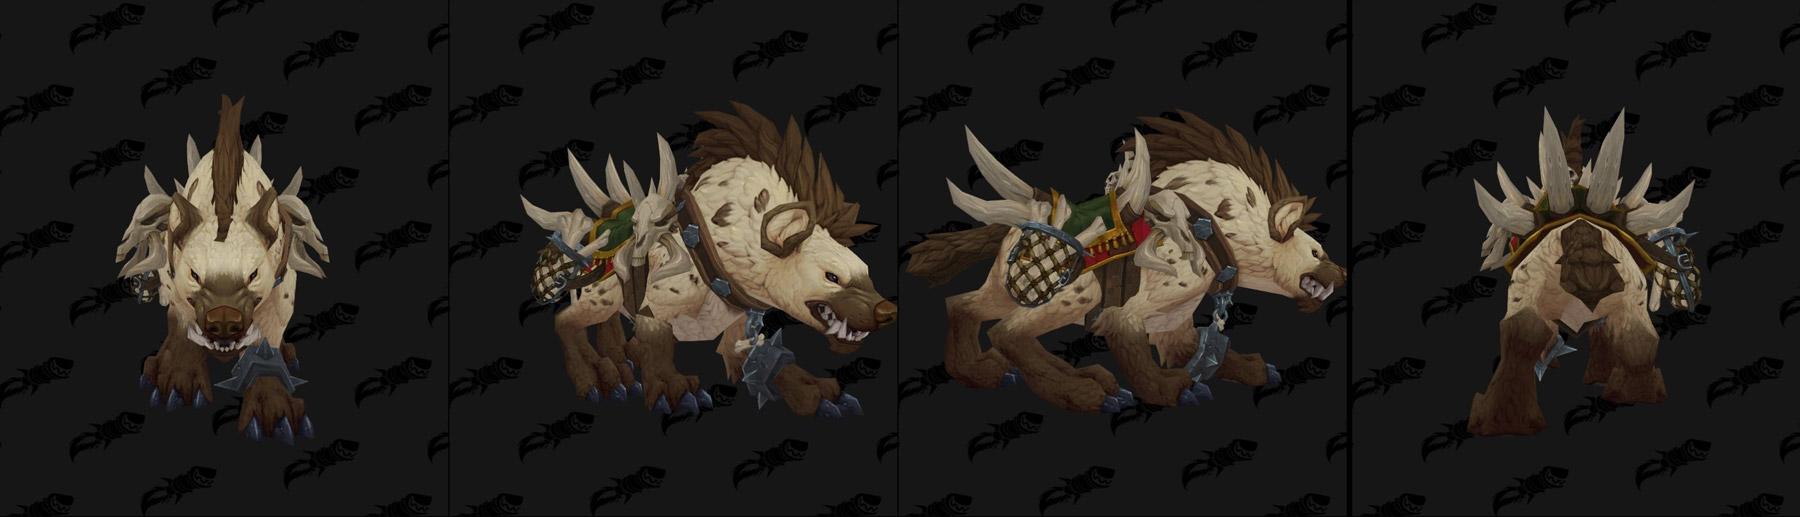 Monture hyène - Battle for Azeroth